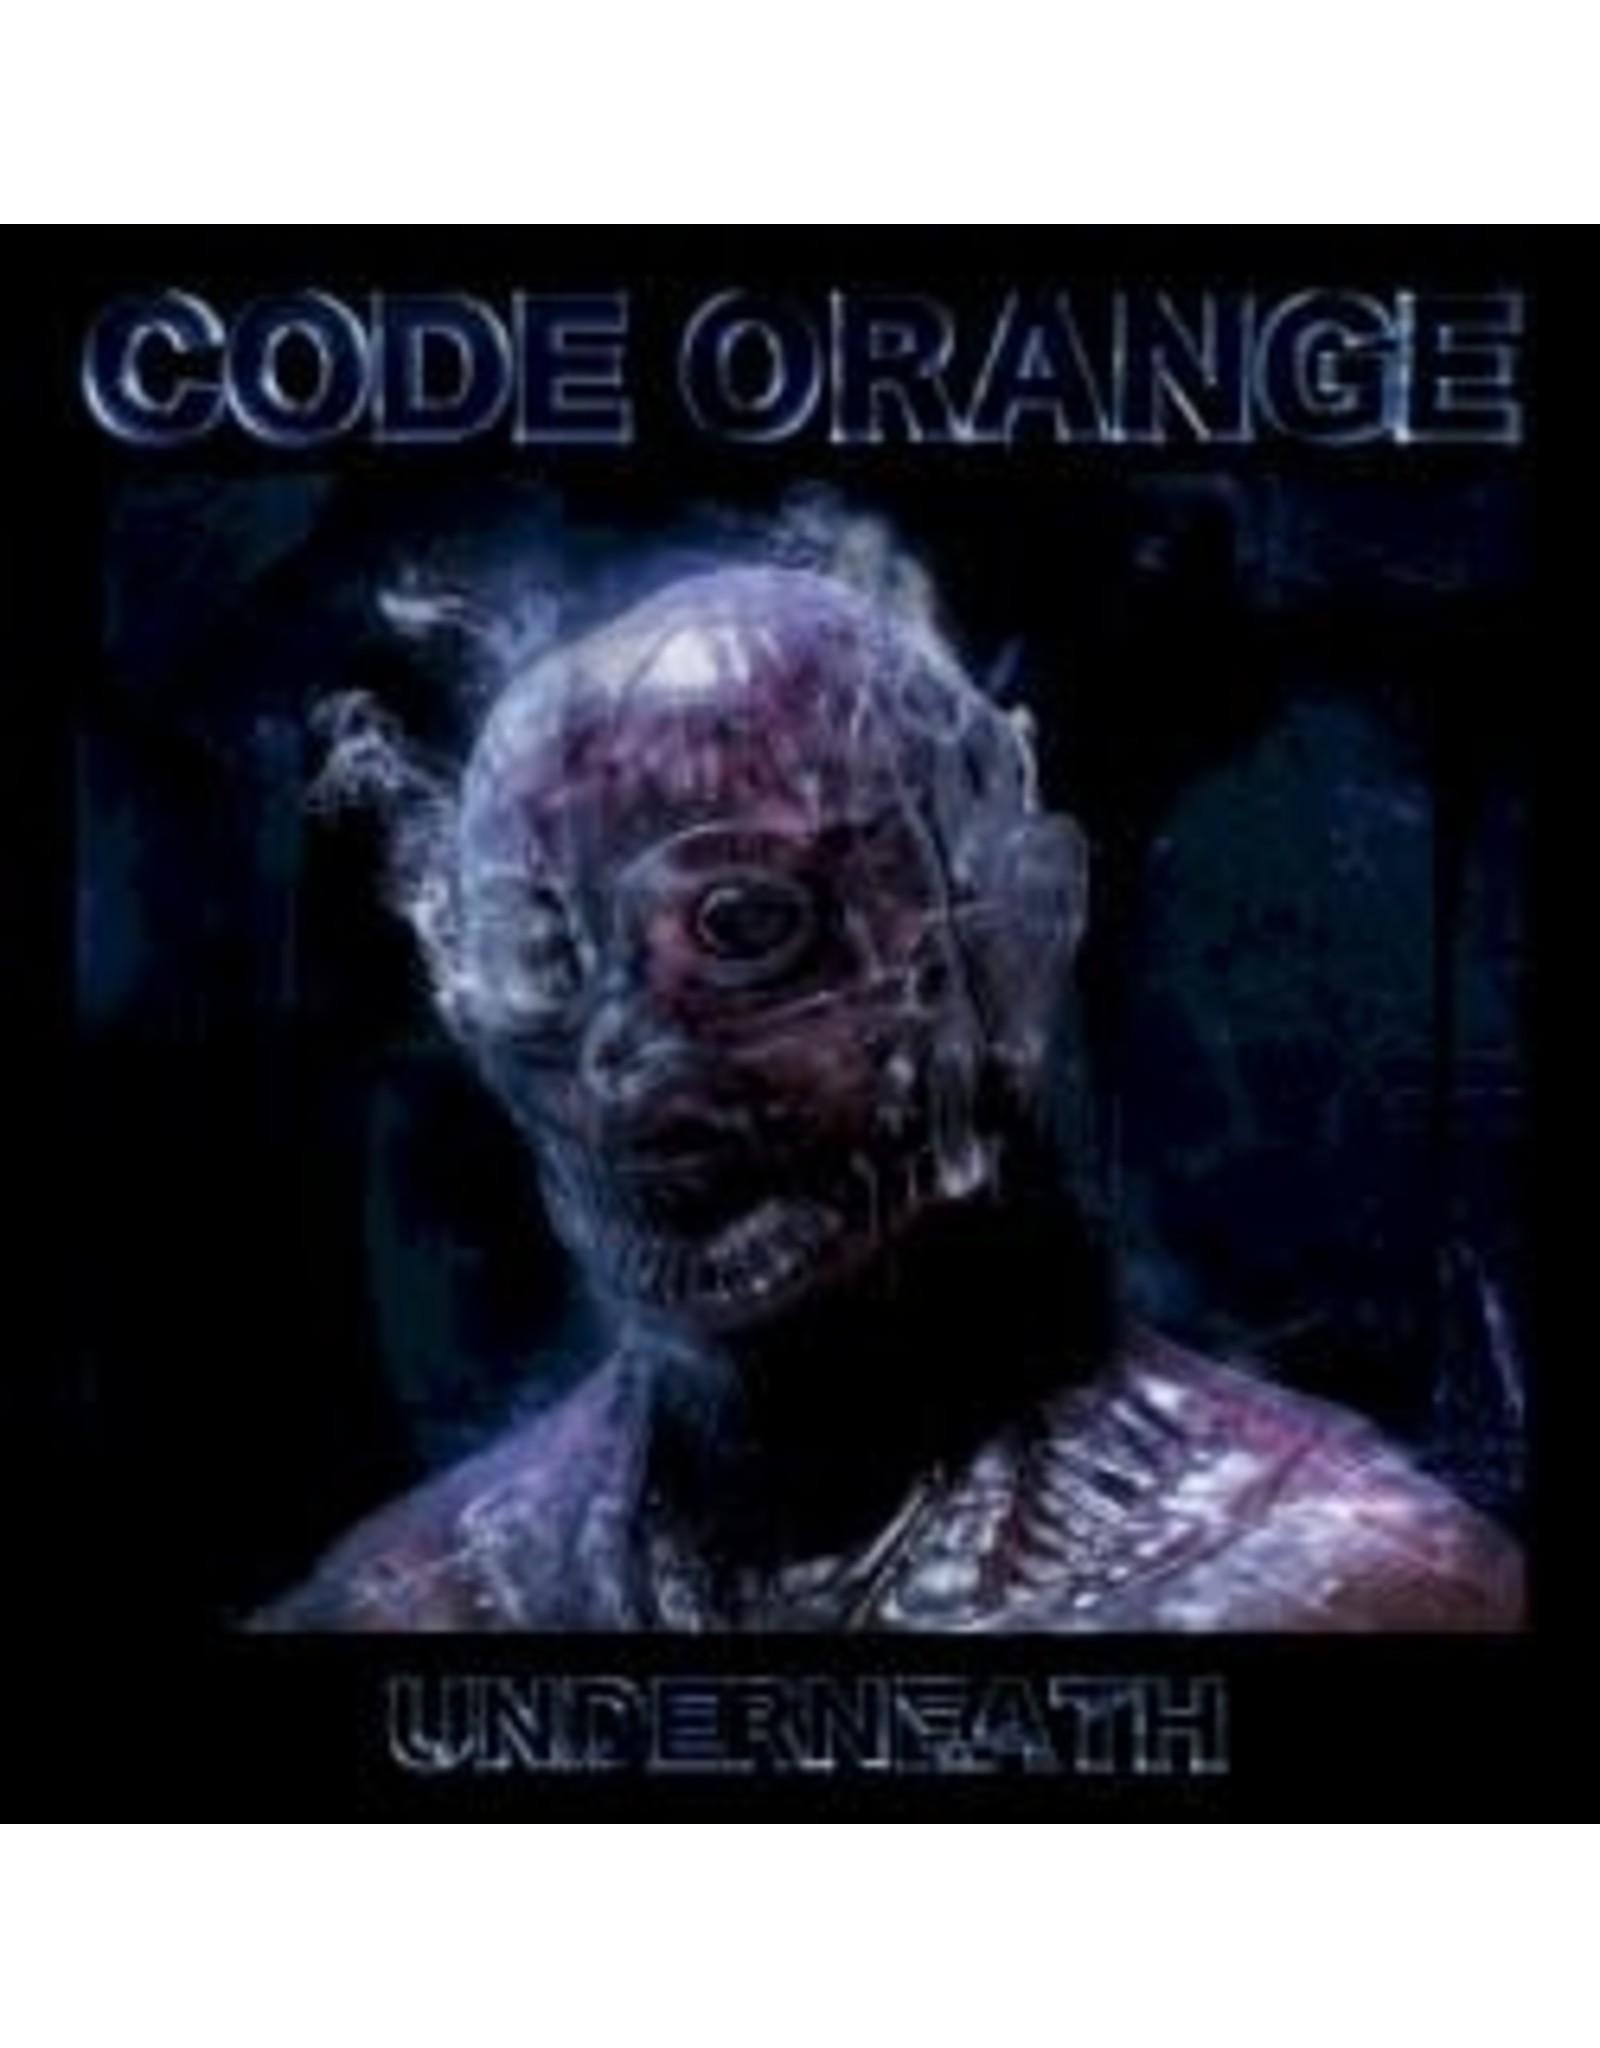 Code Orange - Underneath LP